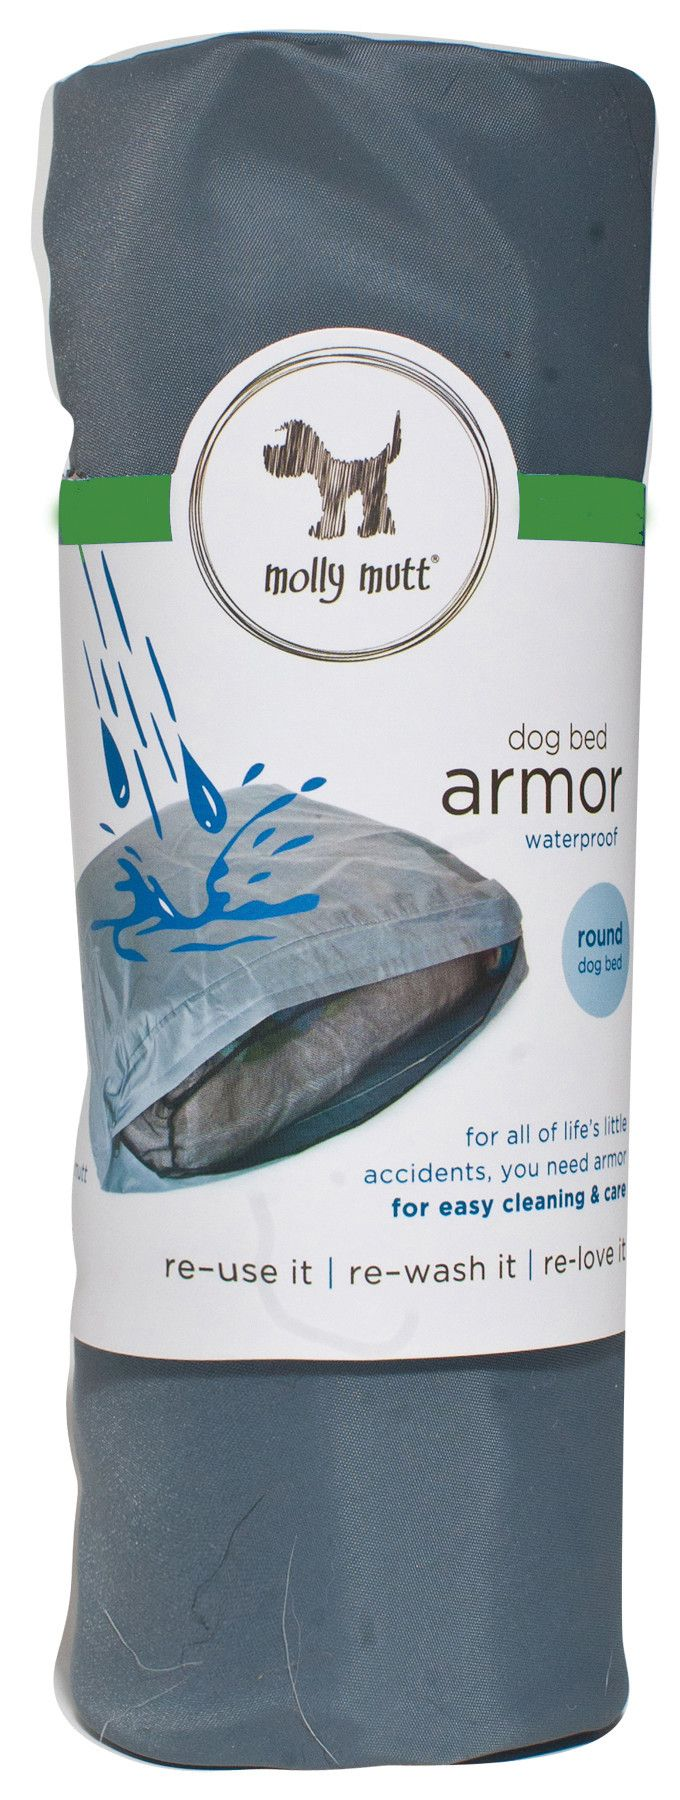 Midnight Train Armor Waterproof Dog Bed Liner